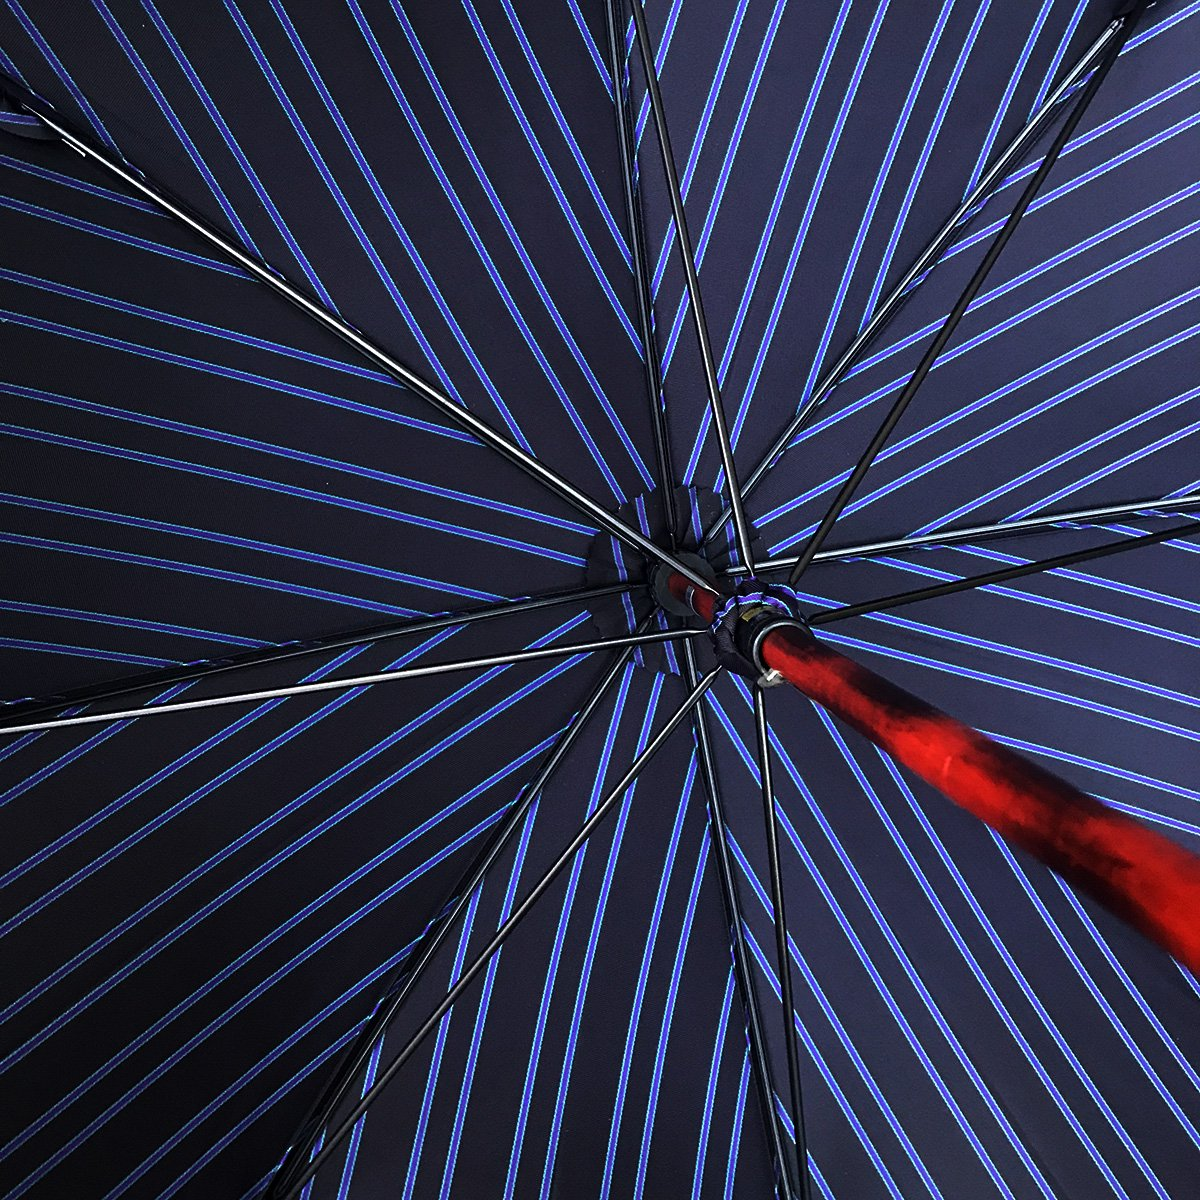 Wフェイス ストライプ 折りたたみ傘 詳細画像11